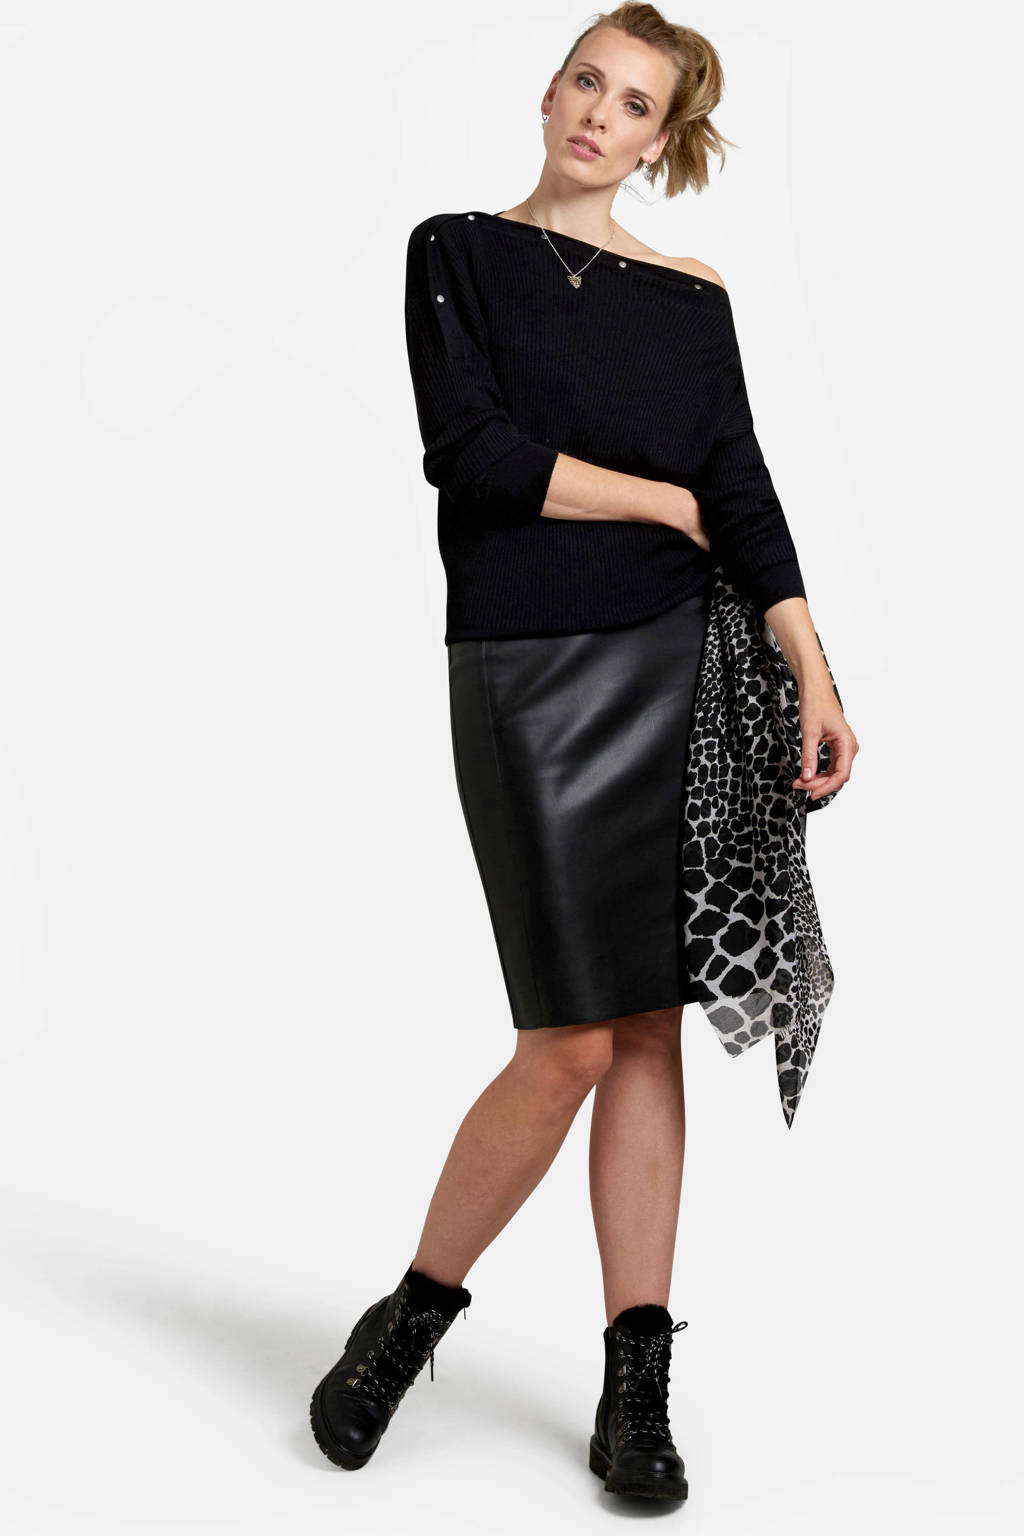 Eksept by Shoeby ribgebreide trui met studs zwart, Zwart